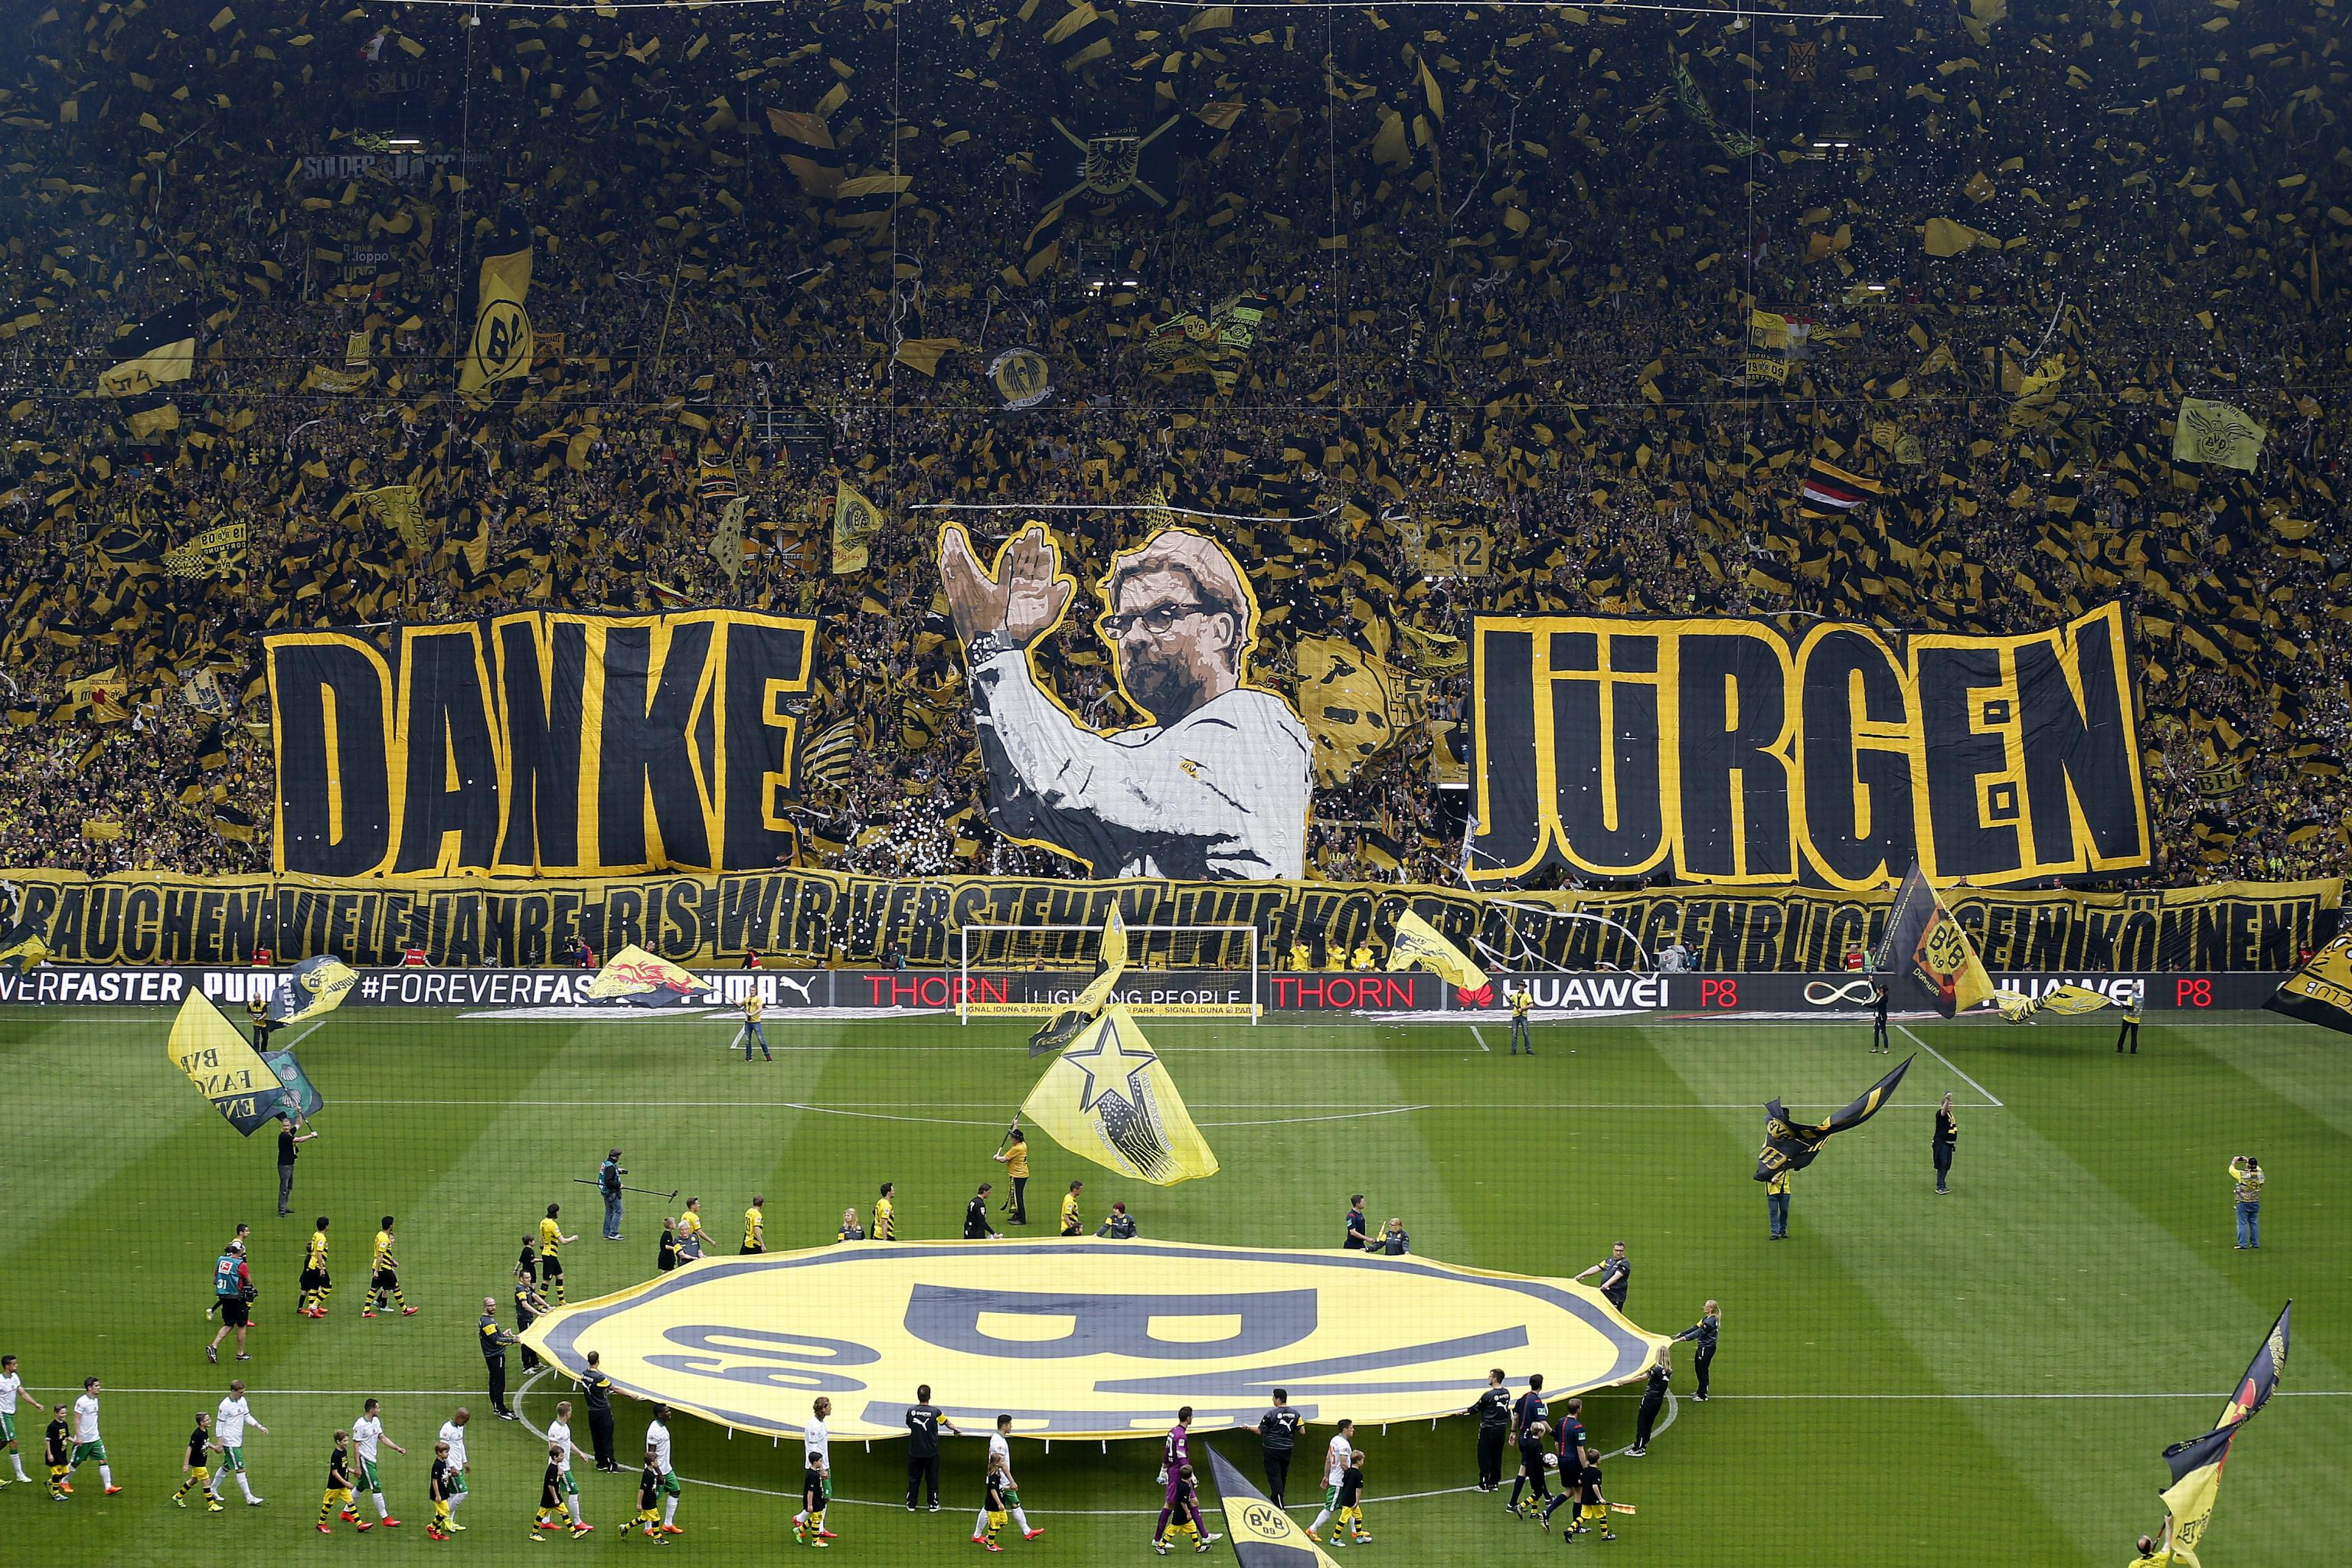 Borussia Dortmund Thank Outgoing Jurgen Klopp With Incredible Display Bleacher Report Latest News Videos And Highlights